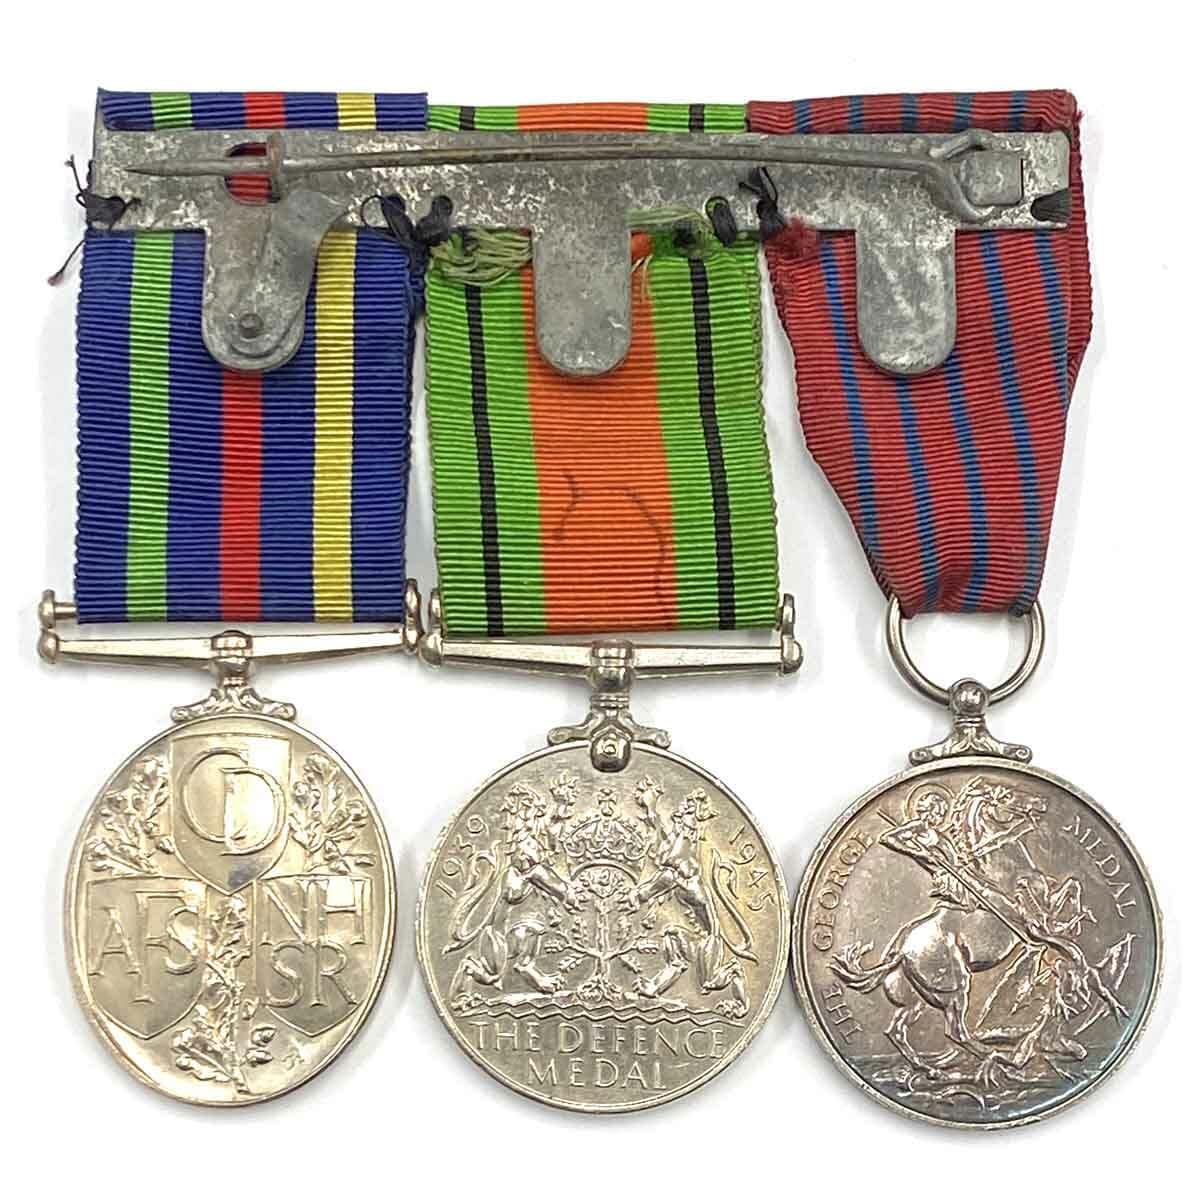 George Medal, Manchester Blitz 3